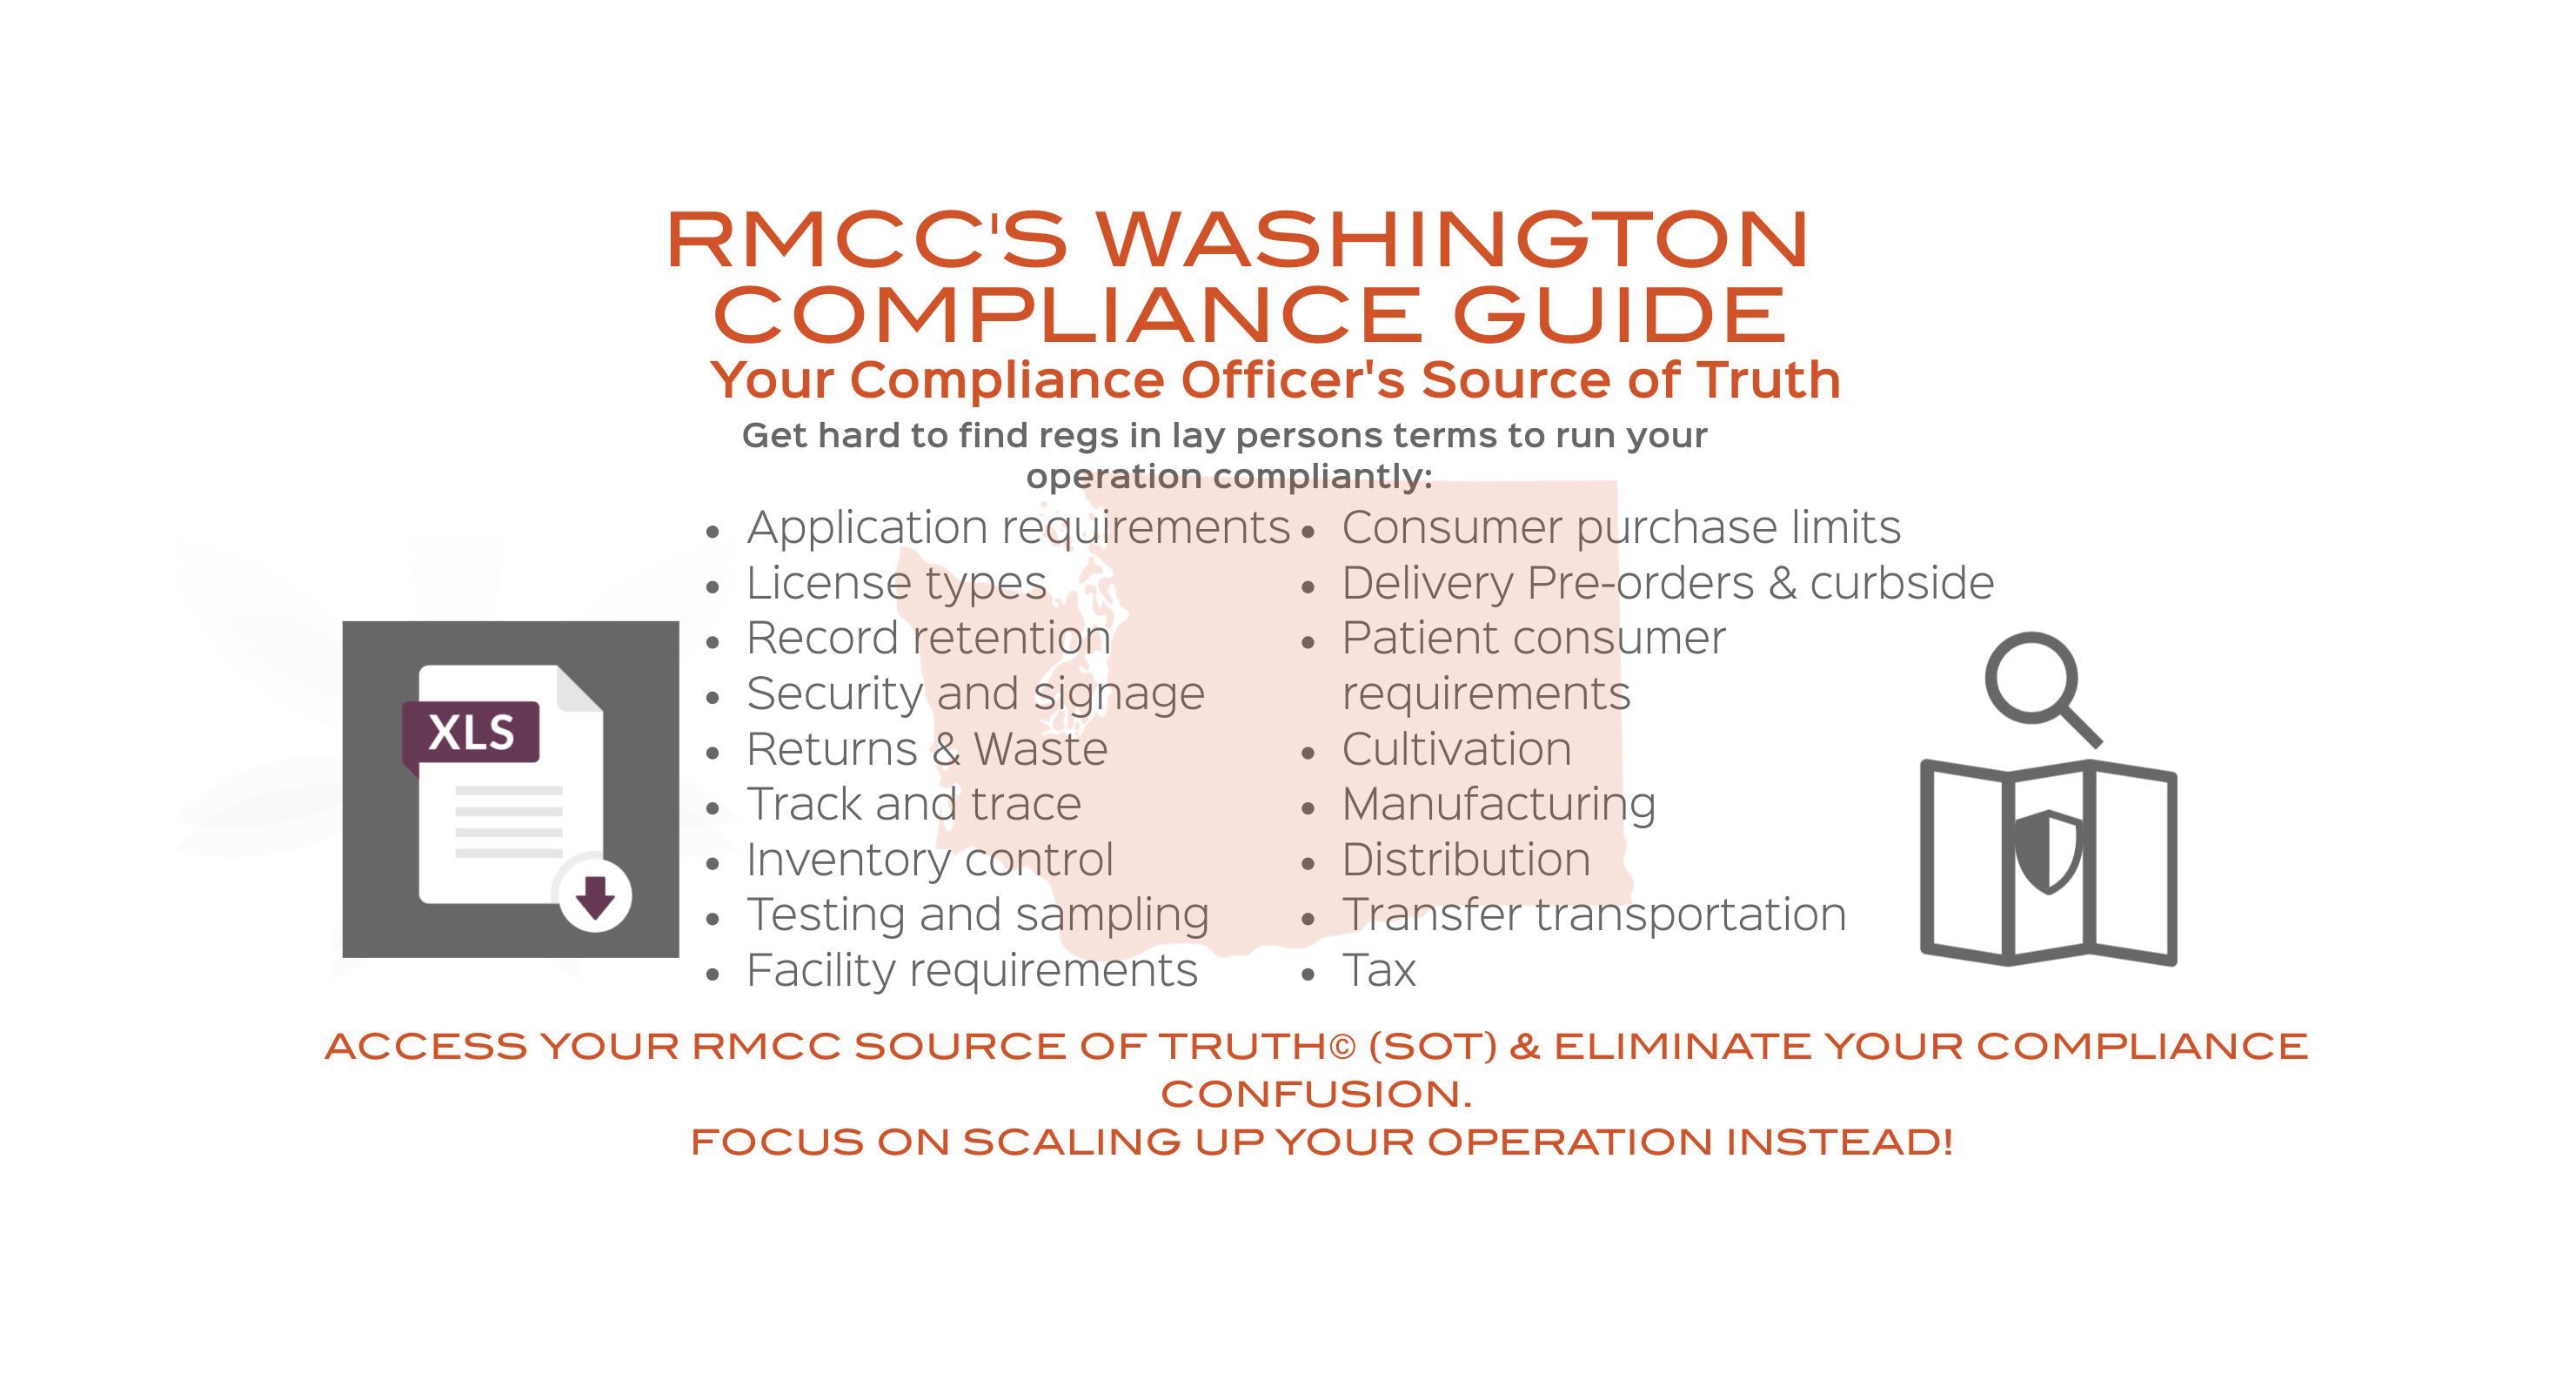 RMCC Washington Cannabis Compliance Guide